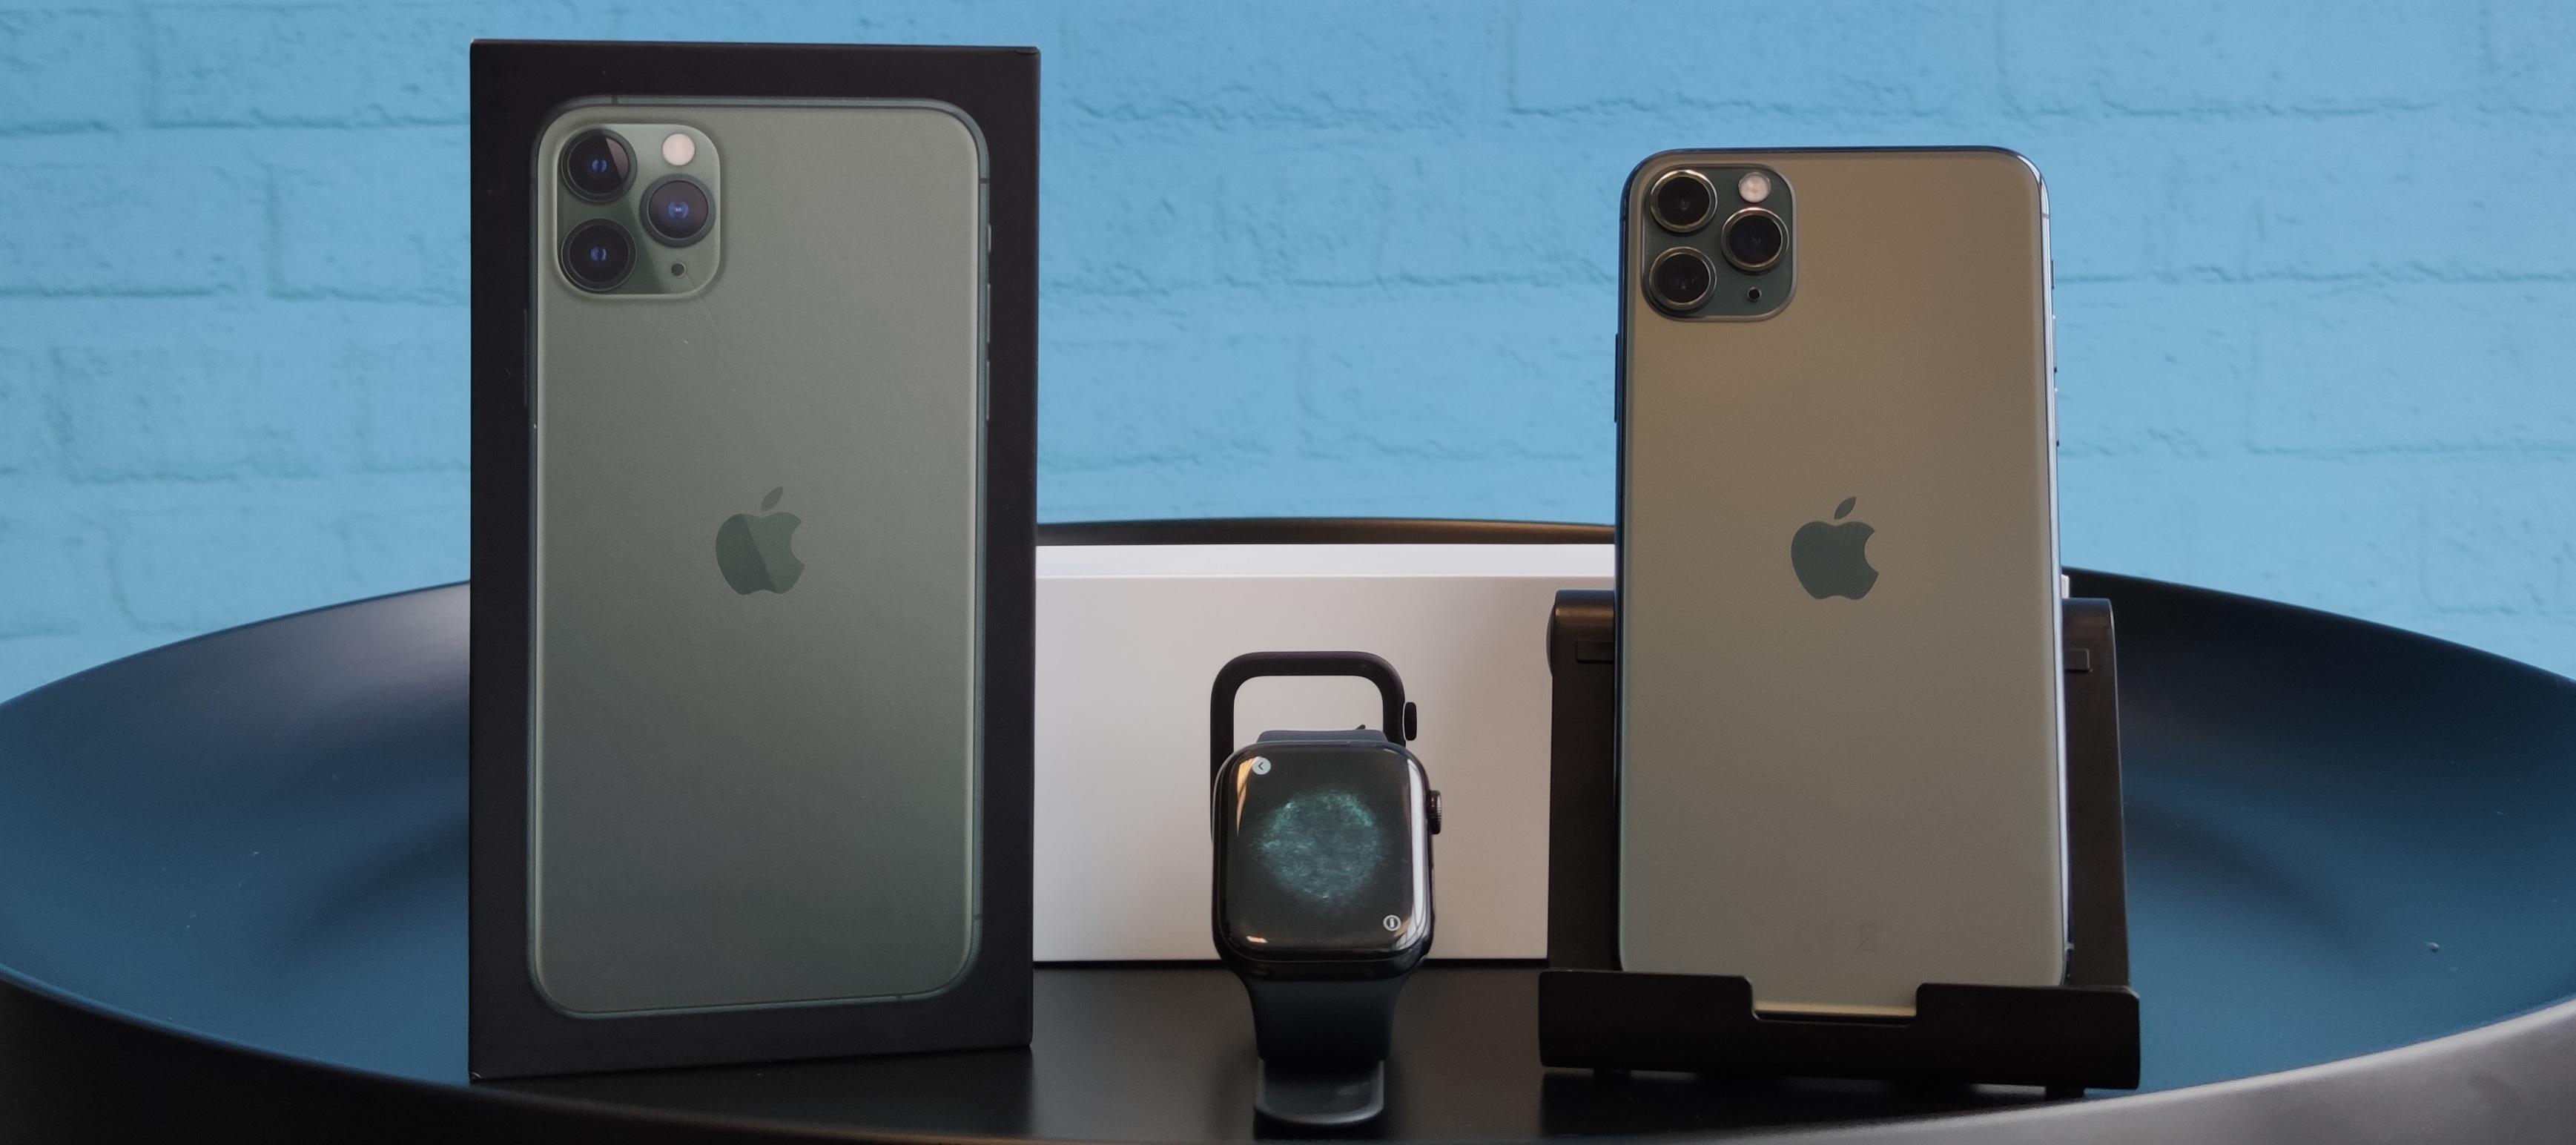 iPhone 11 Pro Max + Apple Watch Series 4 - Maximus Apfelmus! Produkttester/in gesucht!